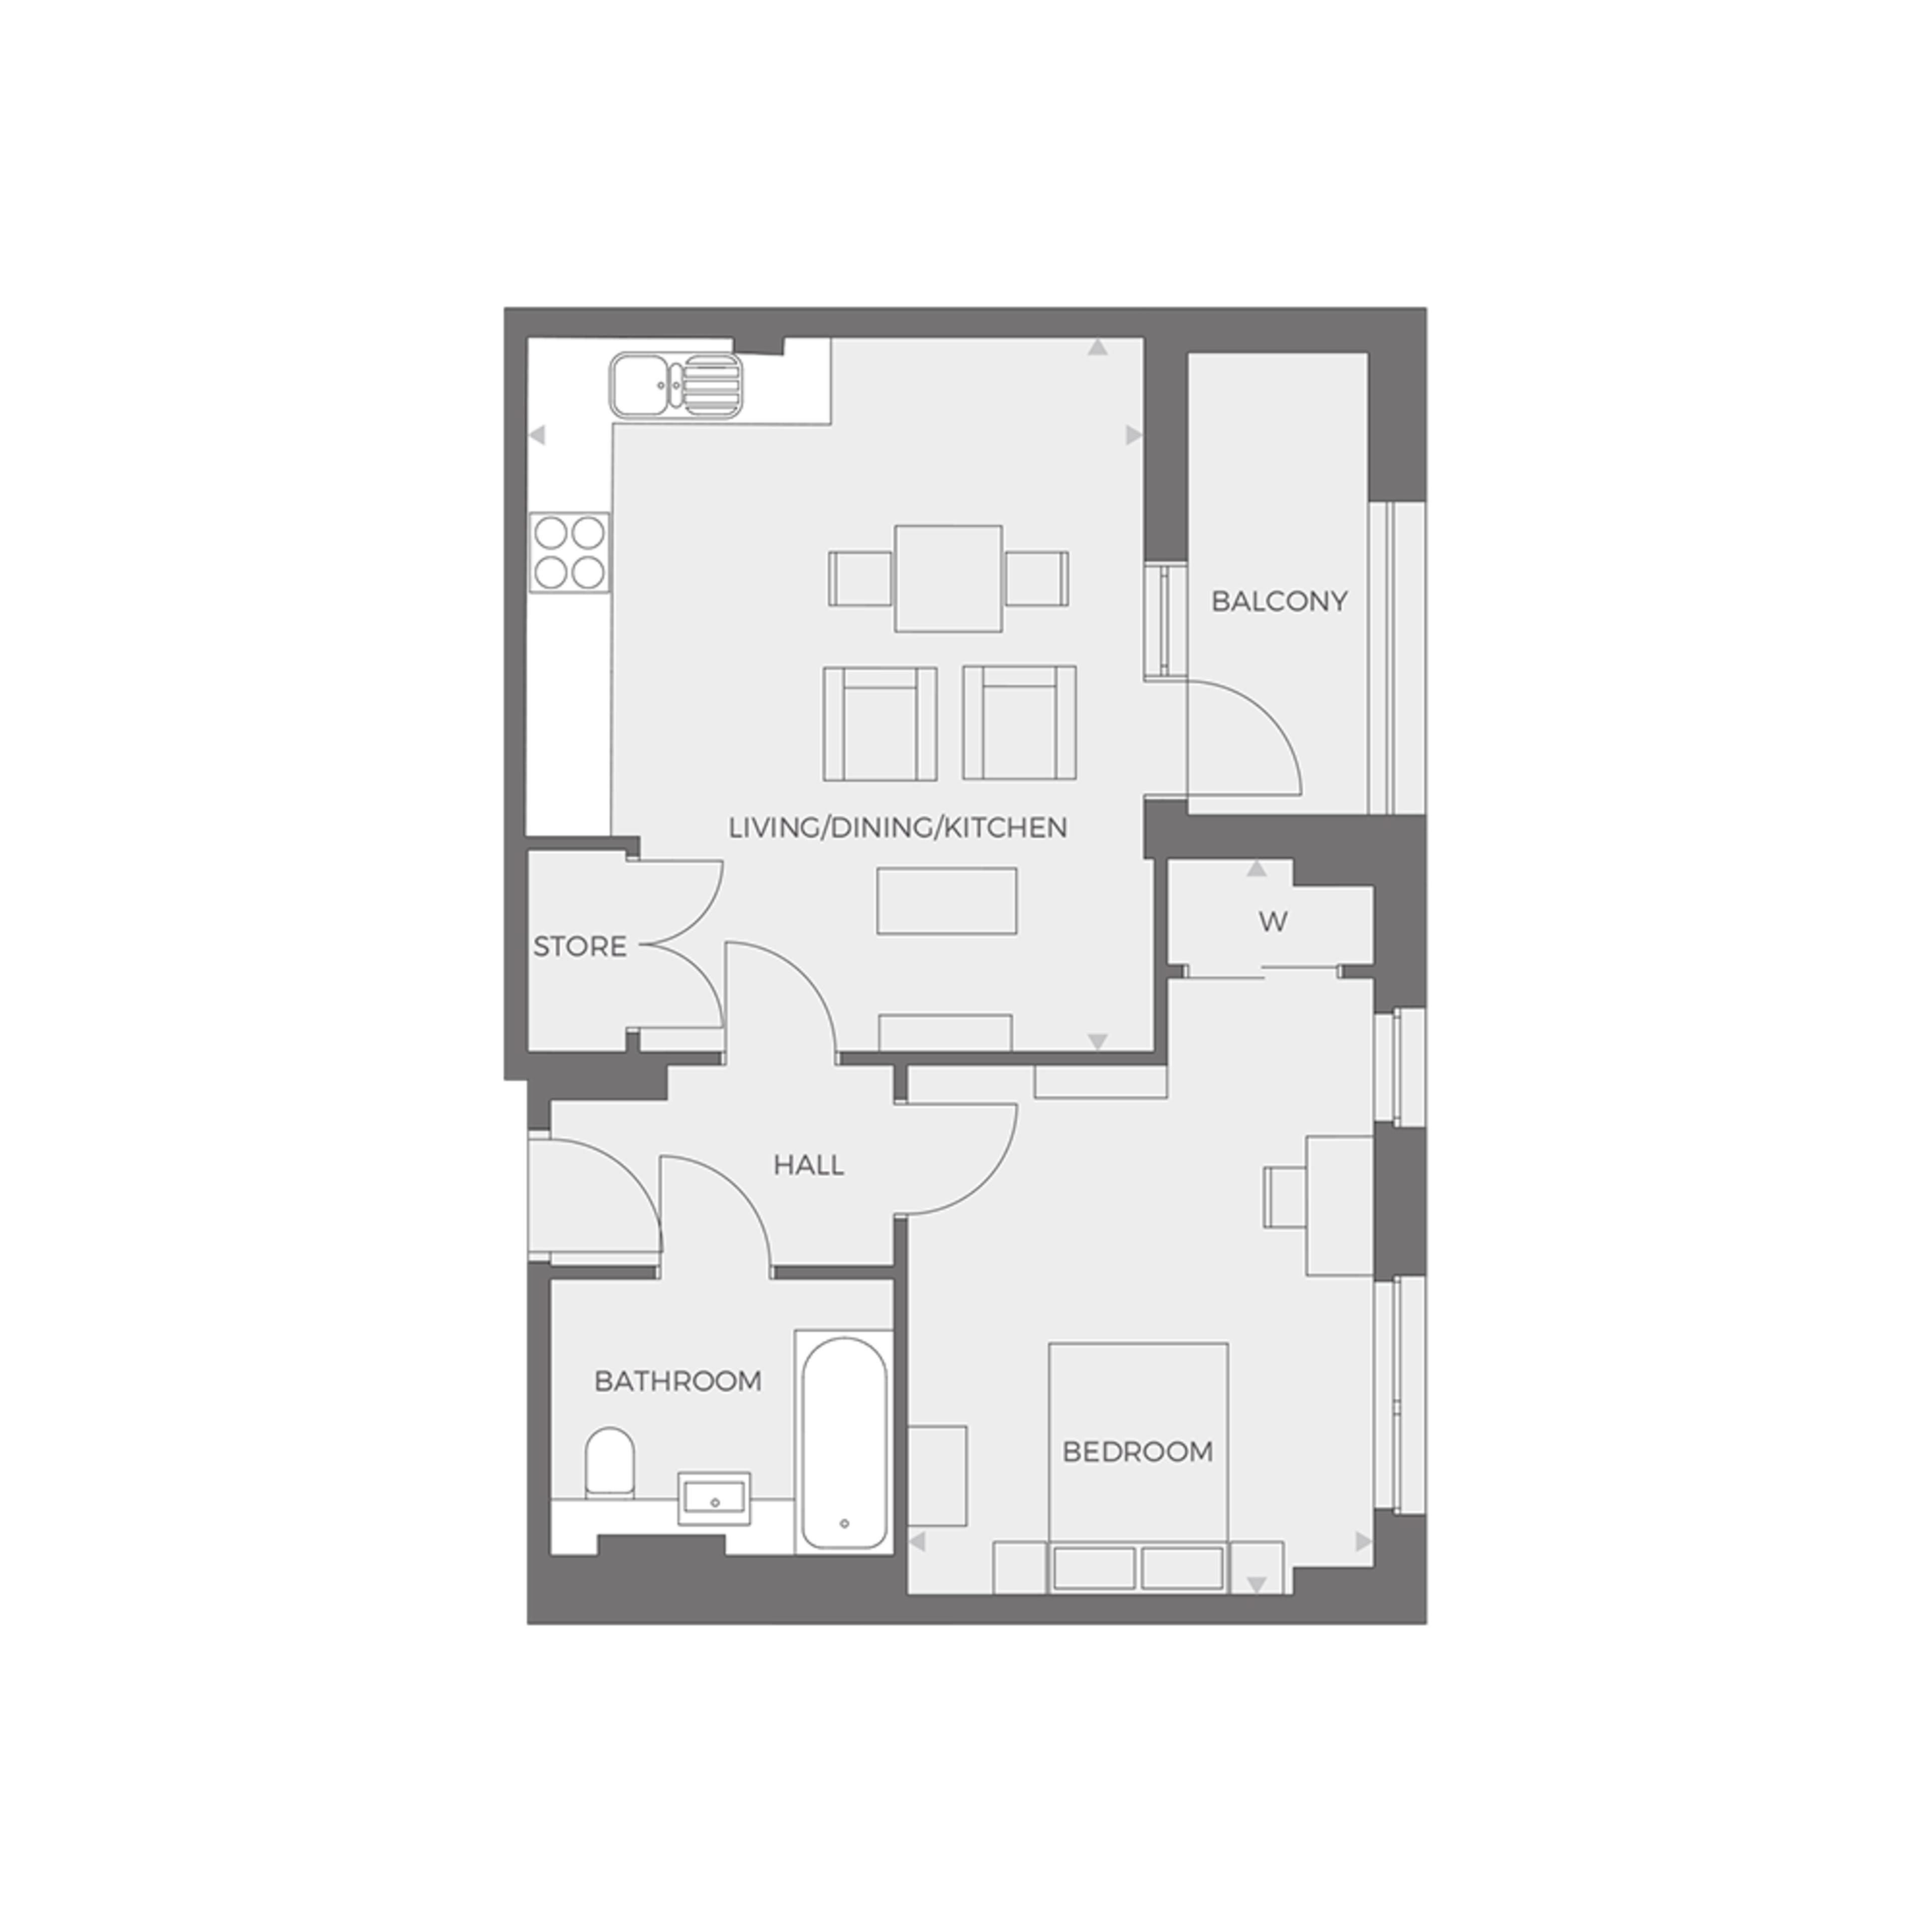 RUB1X - 1 bed Type I floor plan